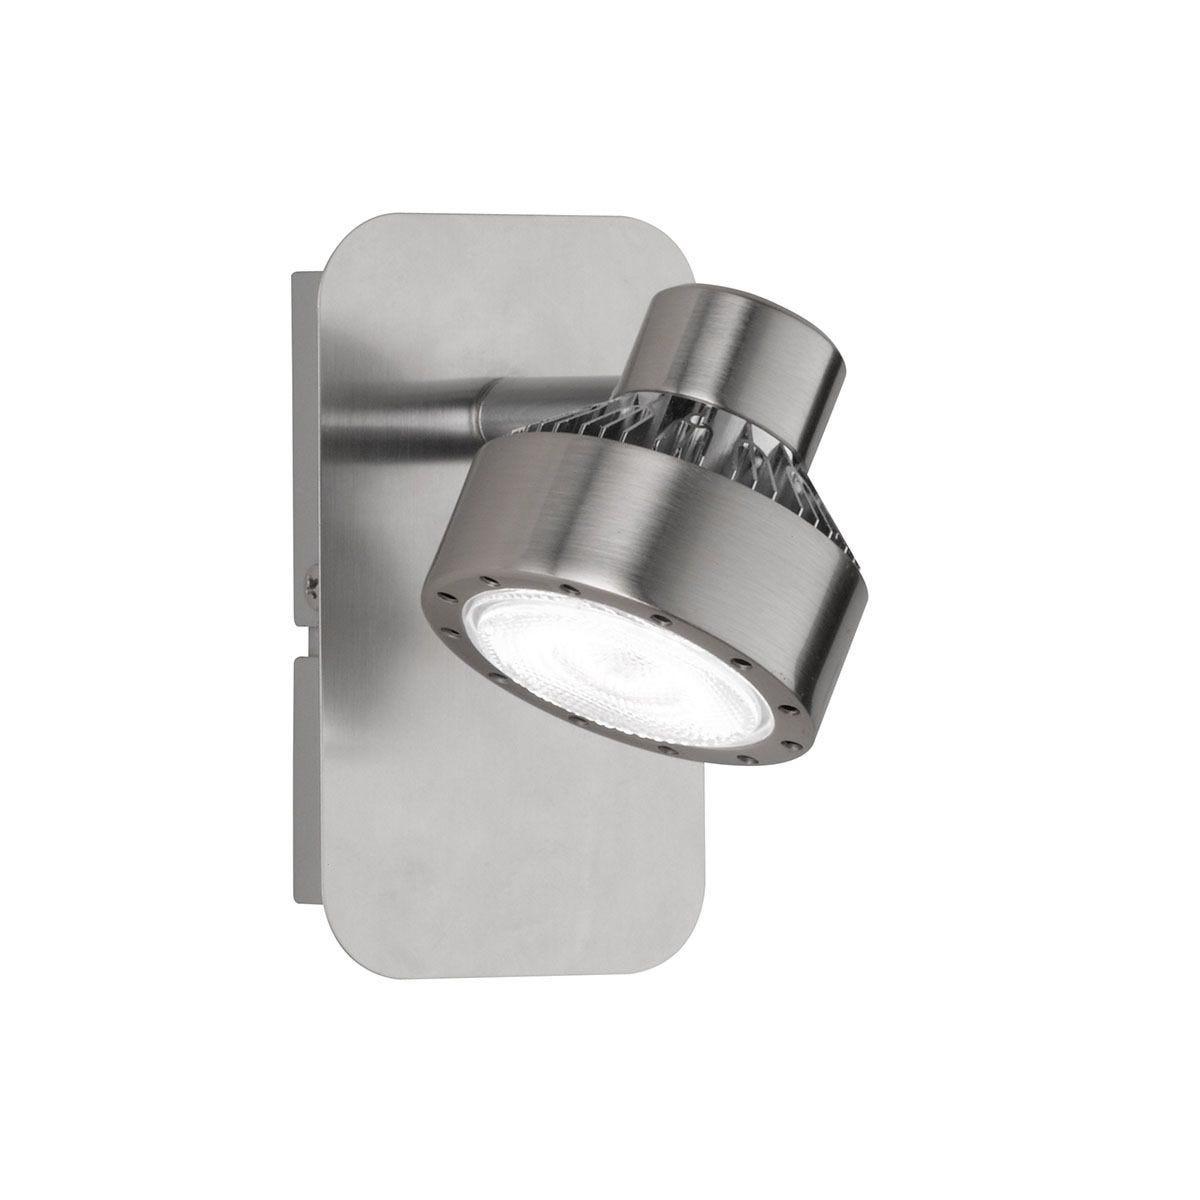 Wofi Local LED Wall Lamp - Nickel Matt Finish & Chrome